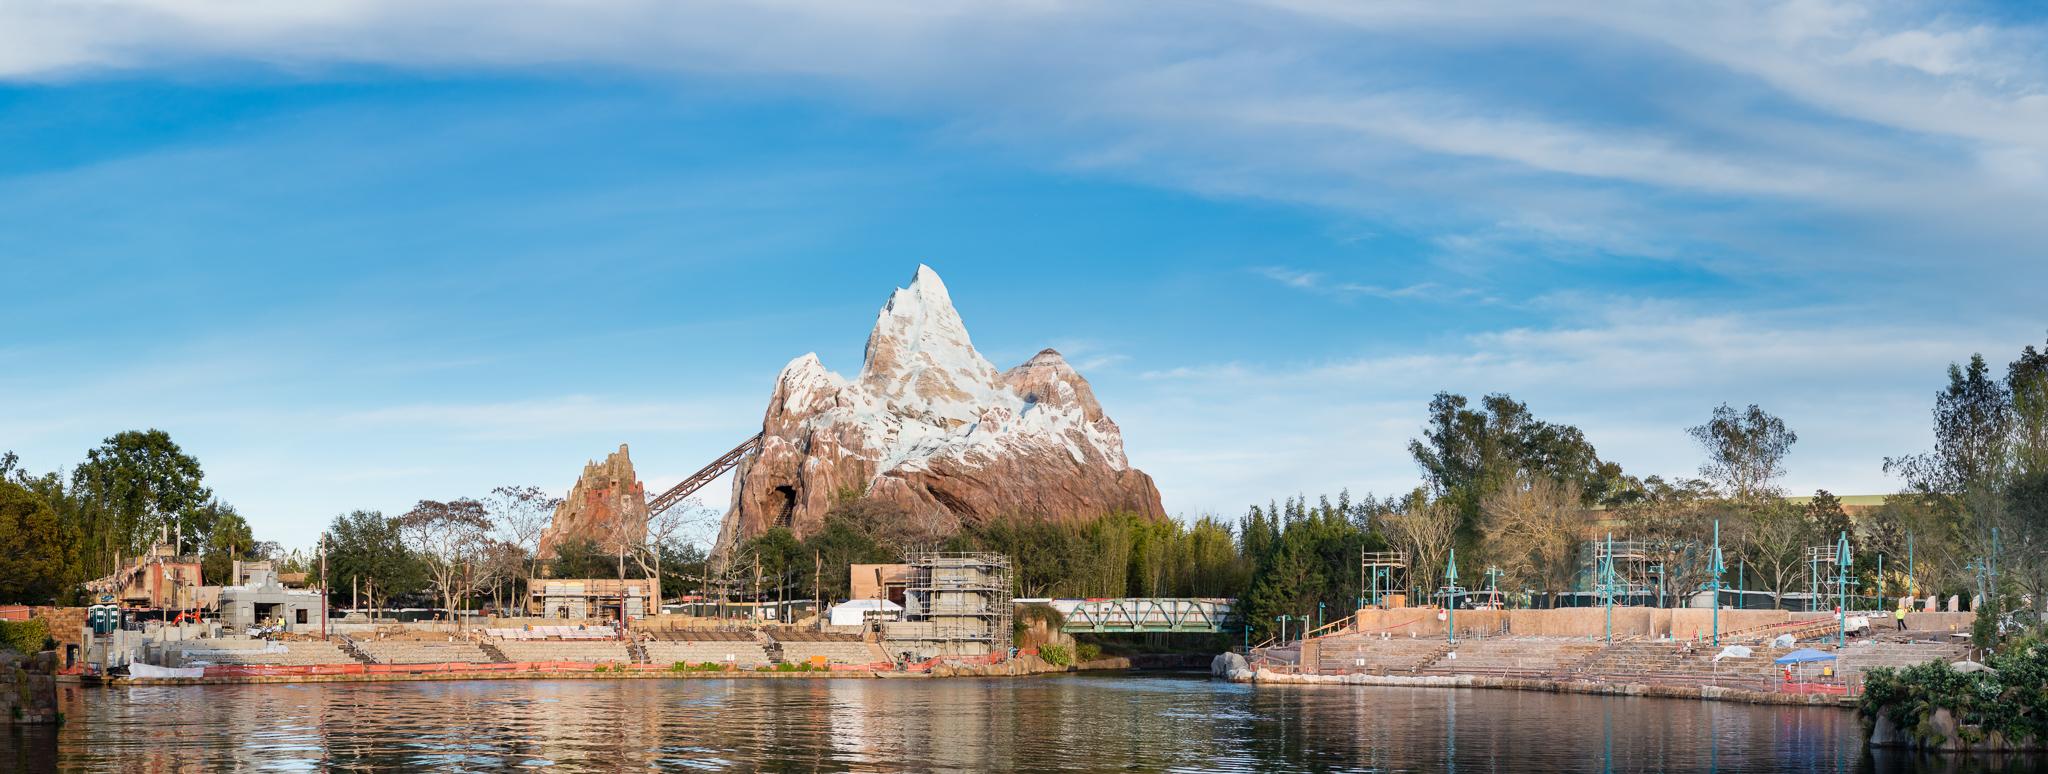 Rivers of Light Construction Progress - Disney's Animal Kingdom